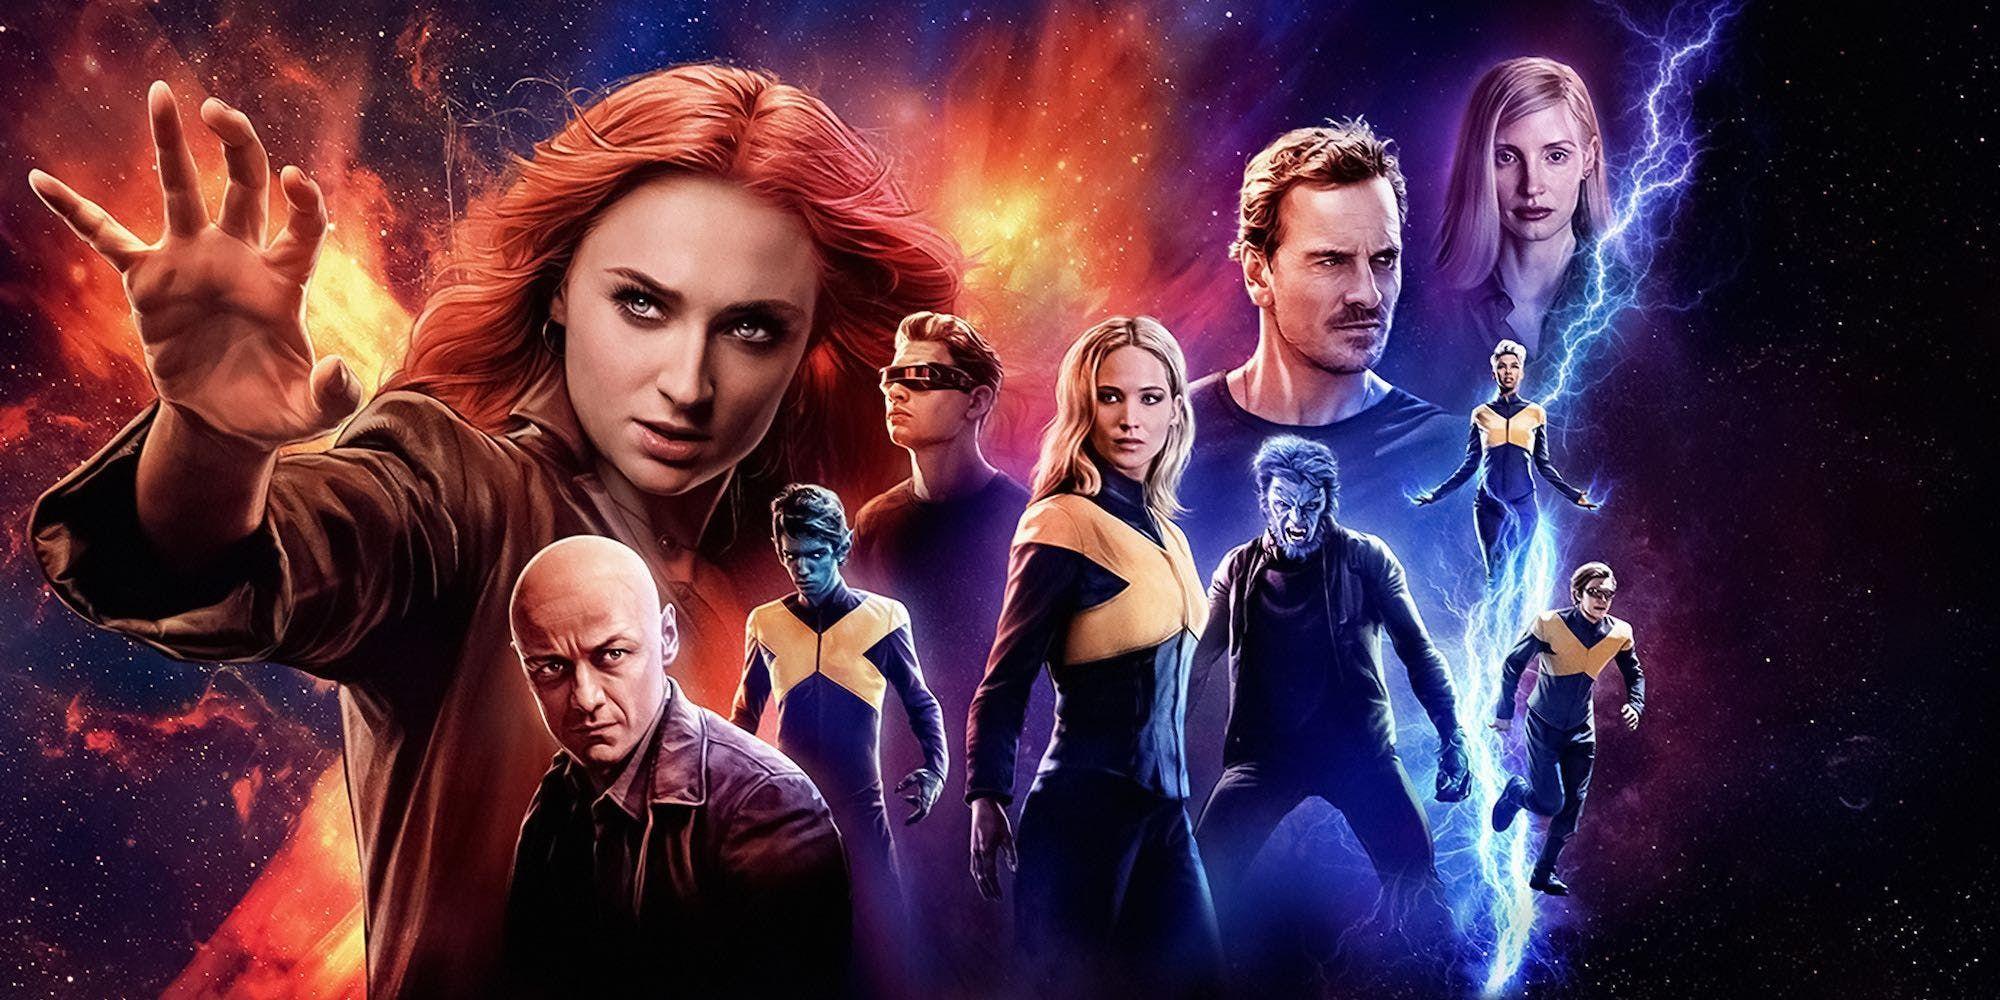 Xfinity Dunks on Dark Phoenix and the Marvel/Sony Spider-Man Split